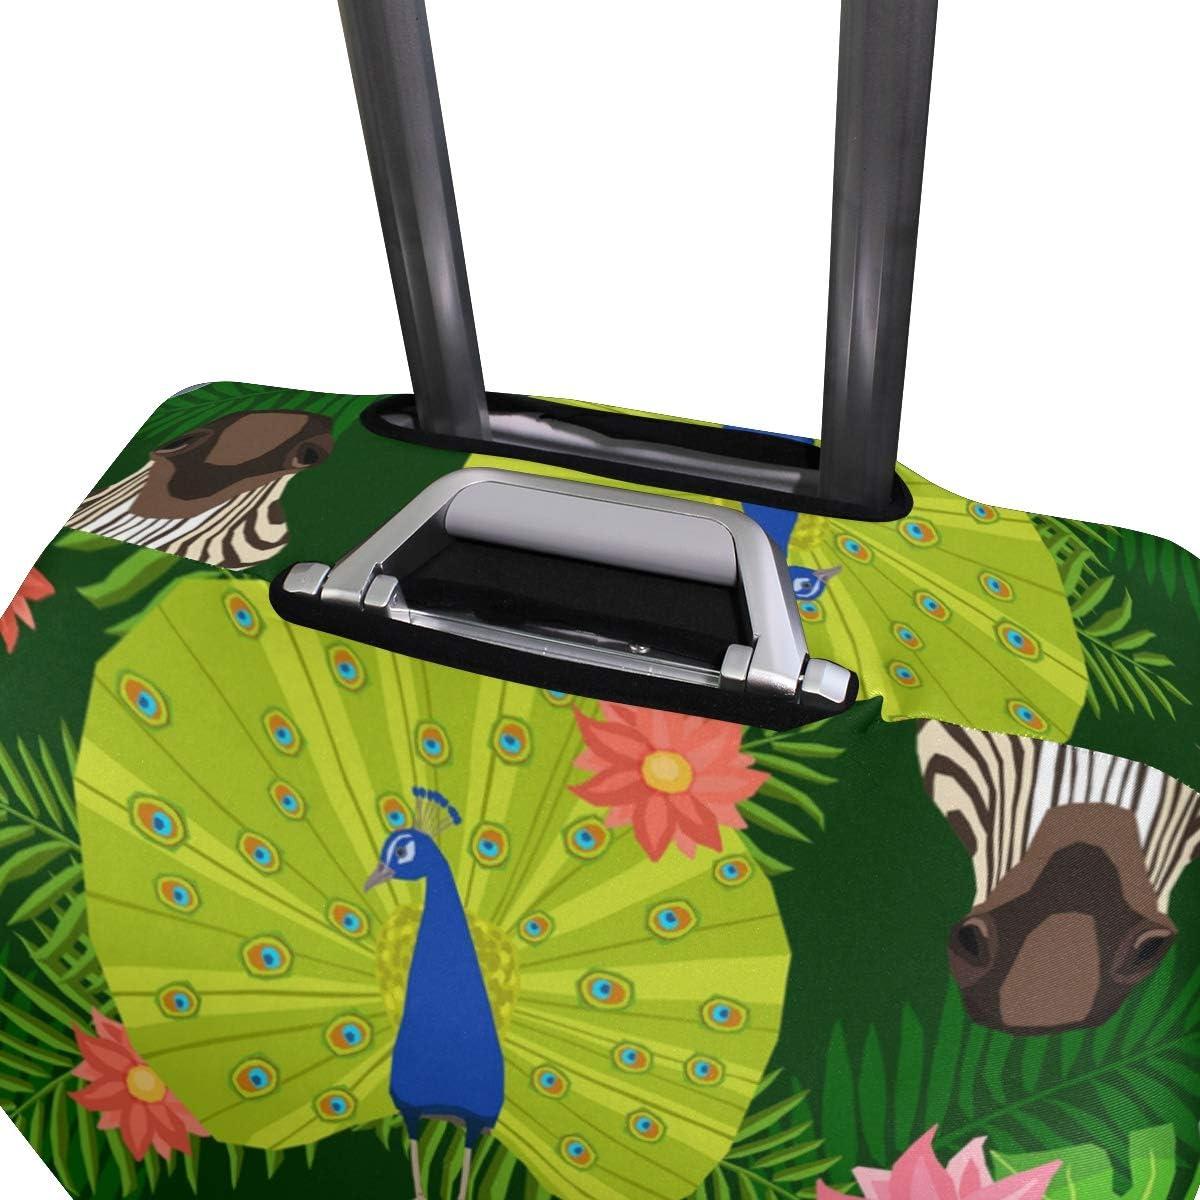 FANTAZIO Animals Panda Peacock Tiger Elepant Parrot Suitcase Protective Cover Luggage Cover